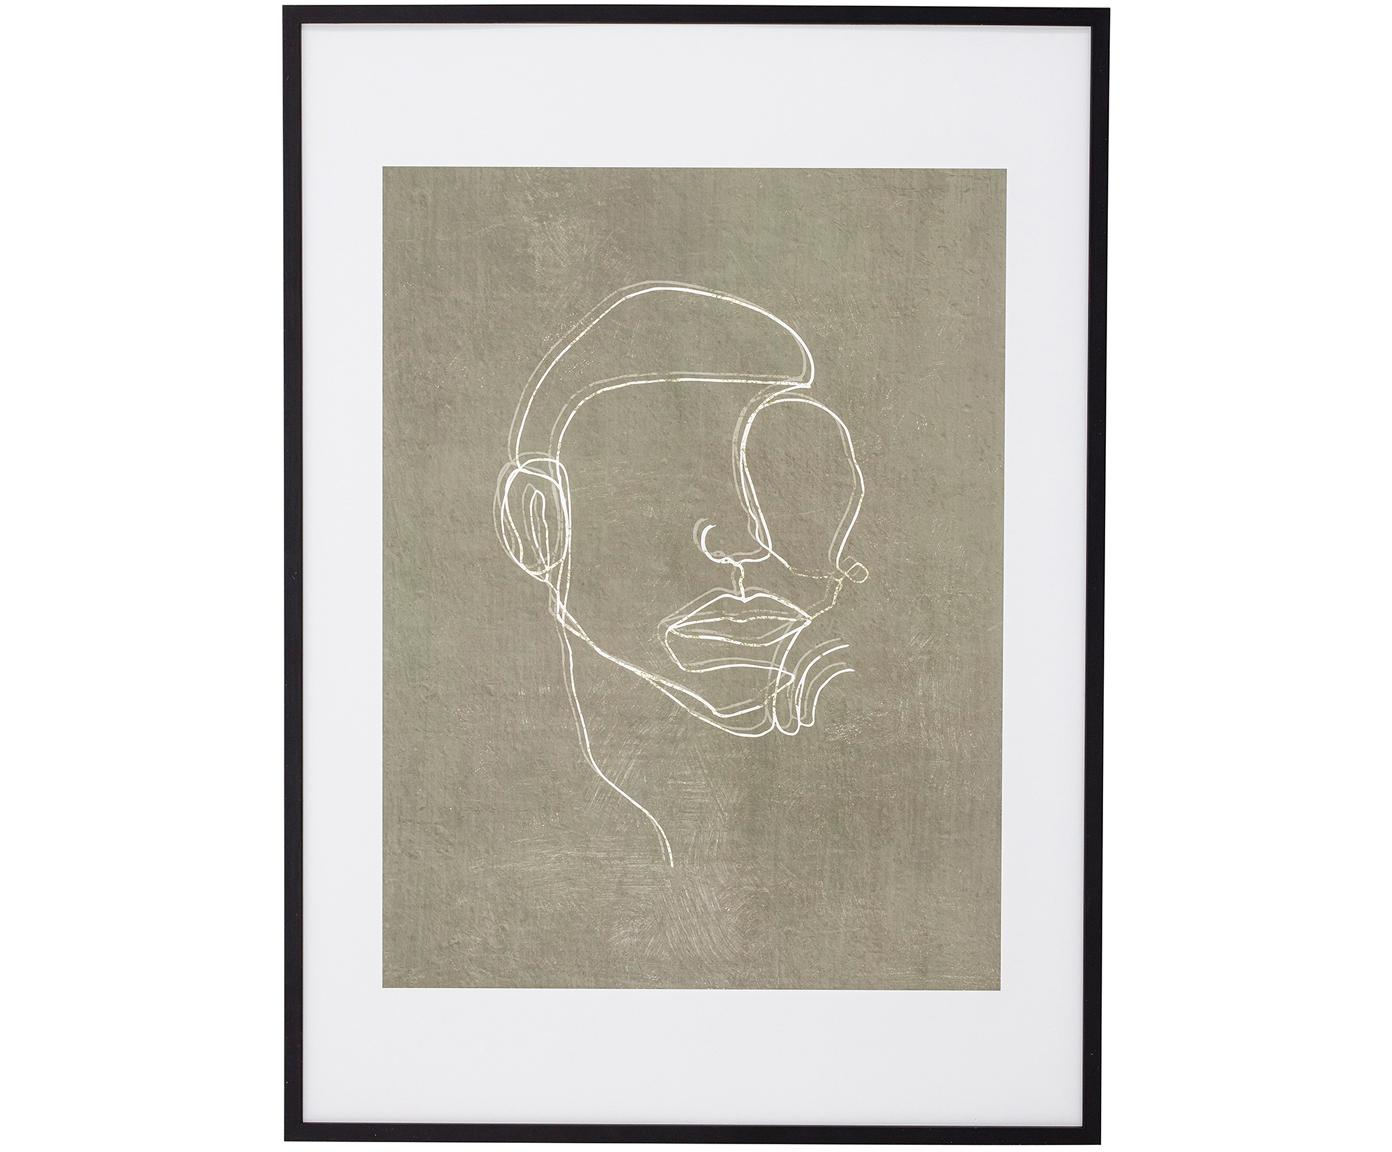 Stampa digitale incorniciata Espen, Cornice: legno, Immagine: carta, Nero, greige, bianco, Larg. 52 x Alt. 72 cm